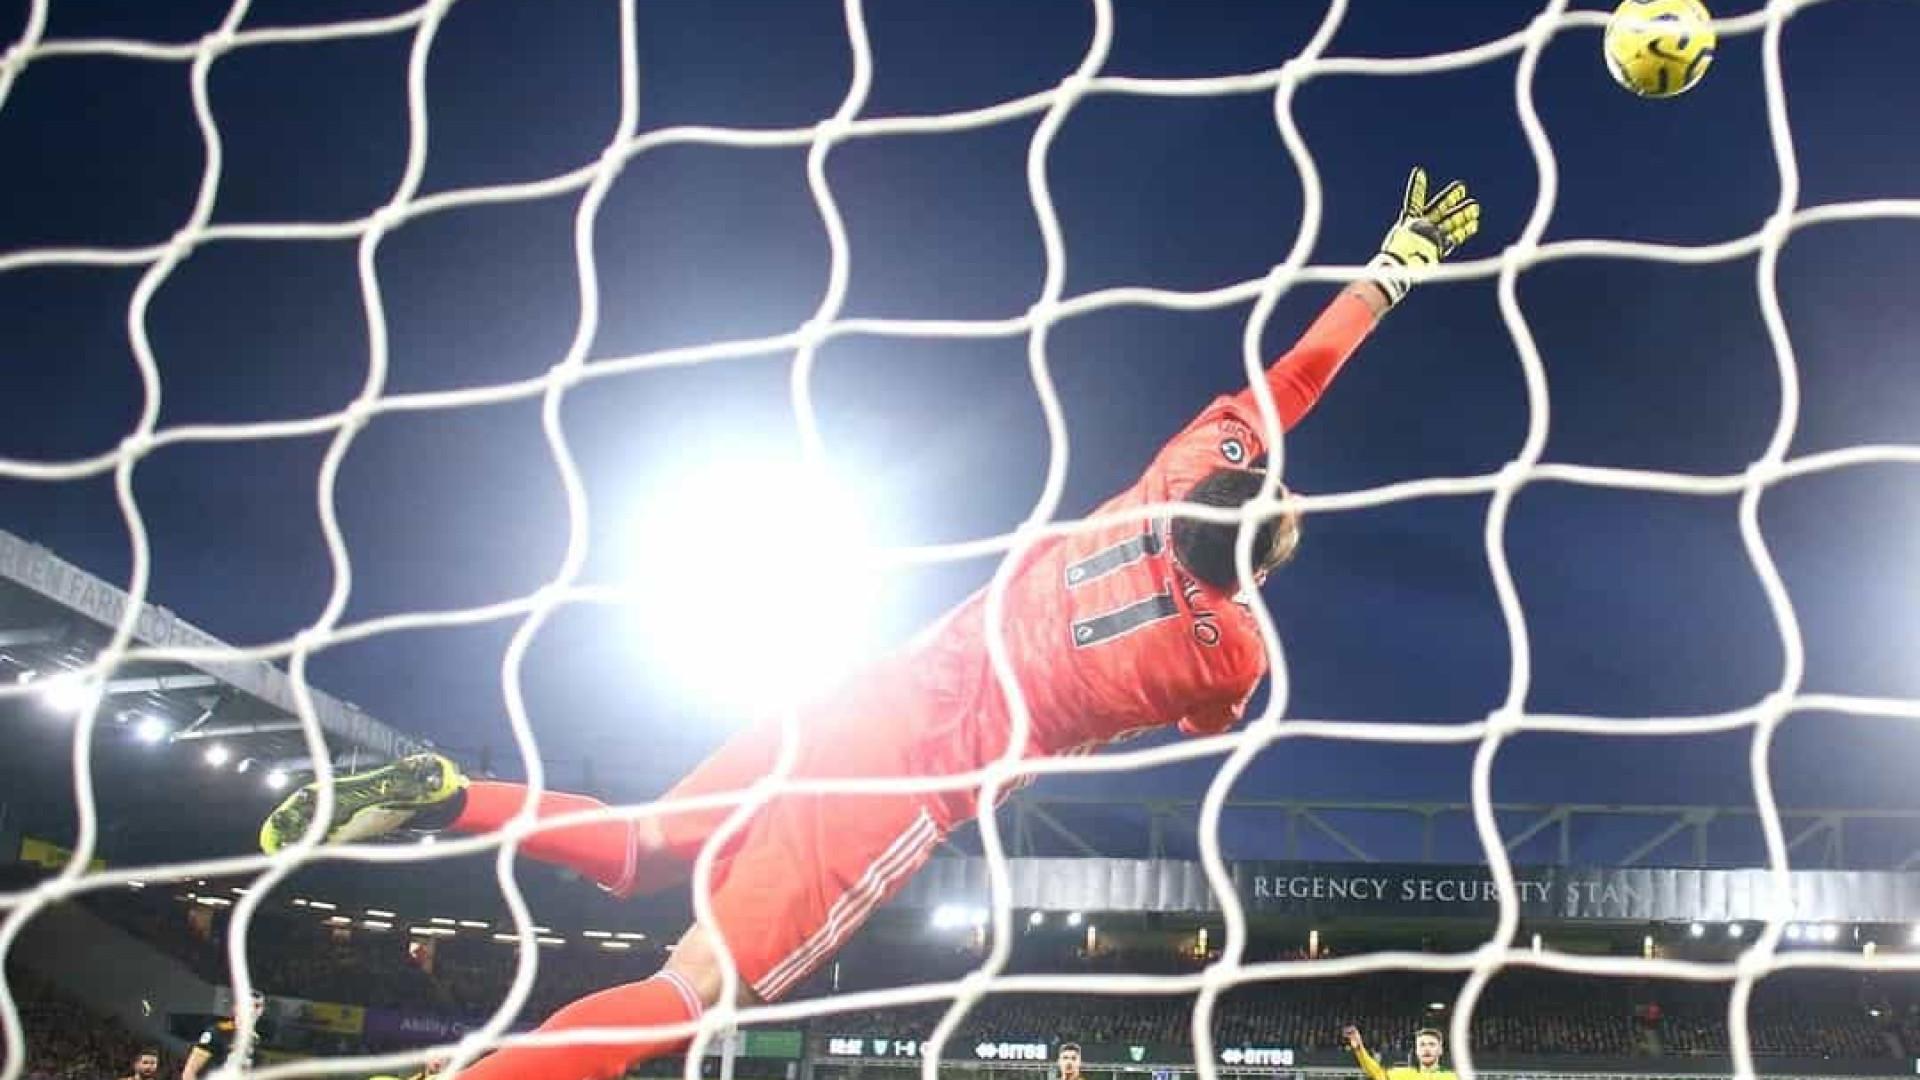 Conmebol anuncia final da Libertadores às 17 horas, dia 30, no Maracanã